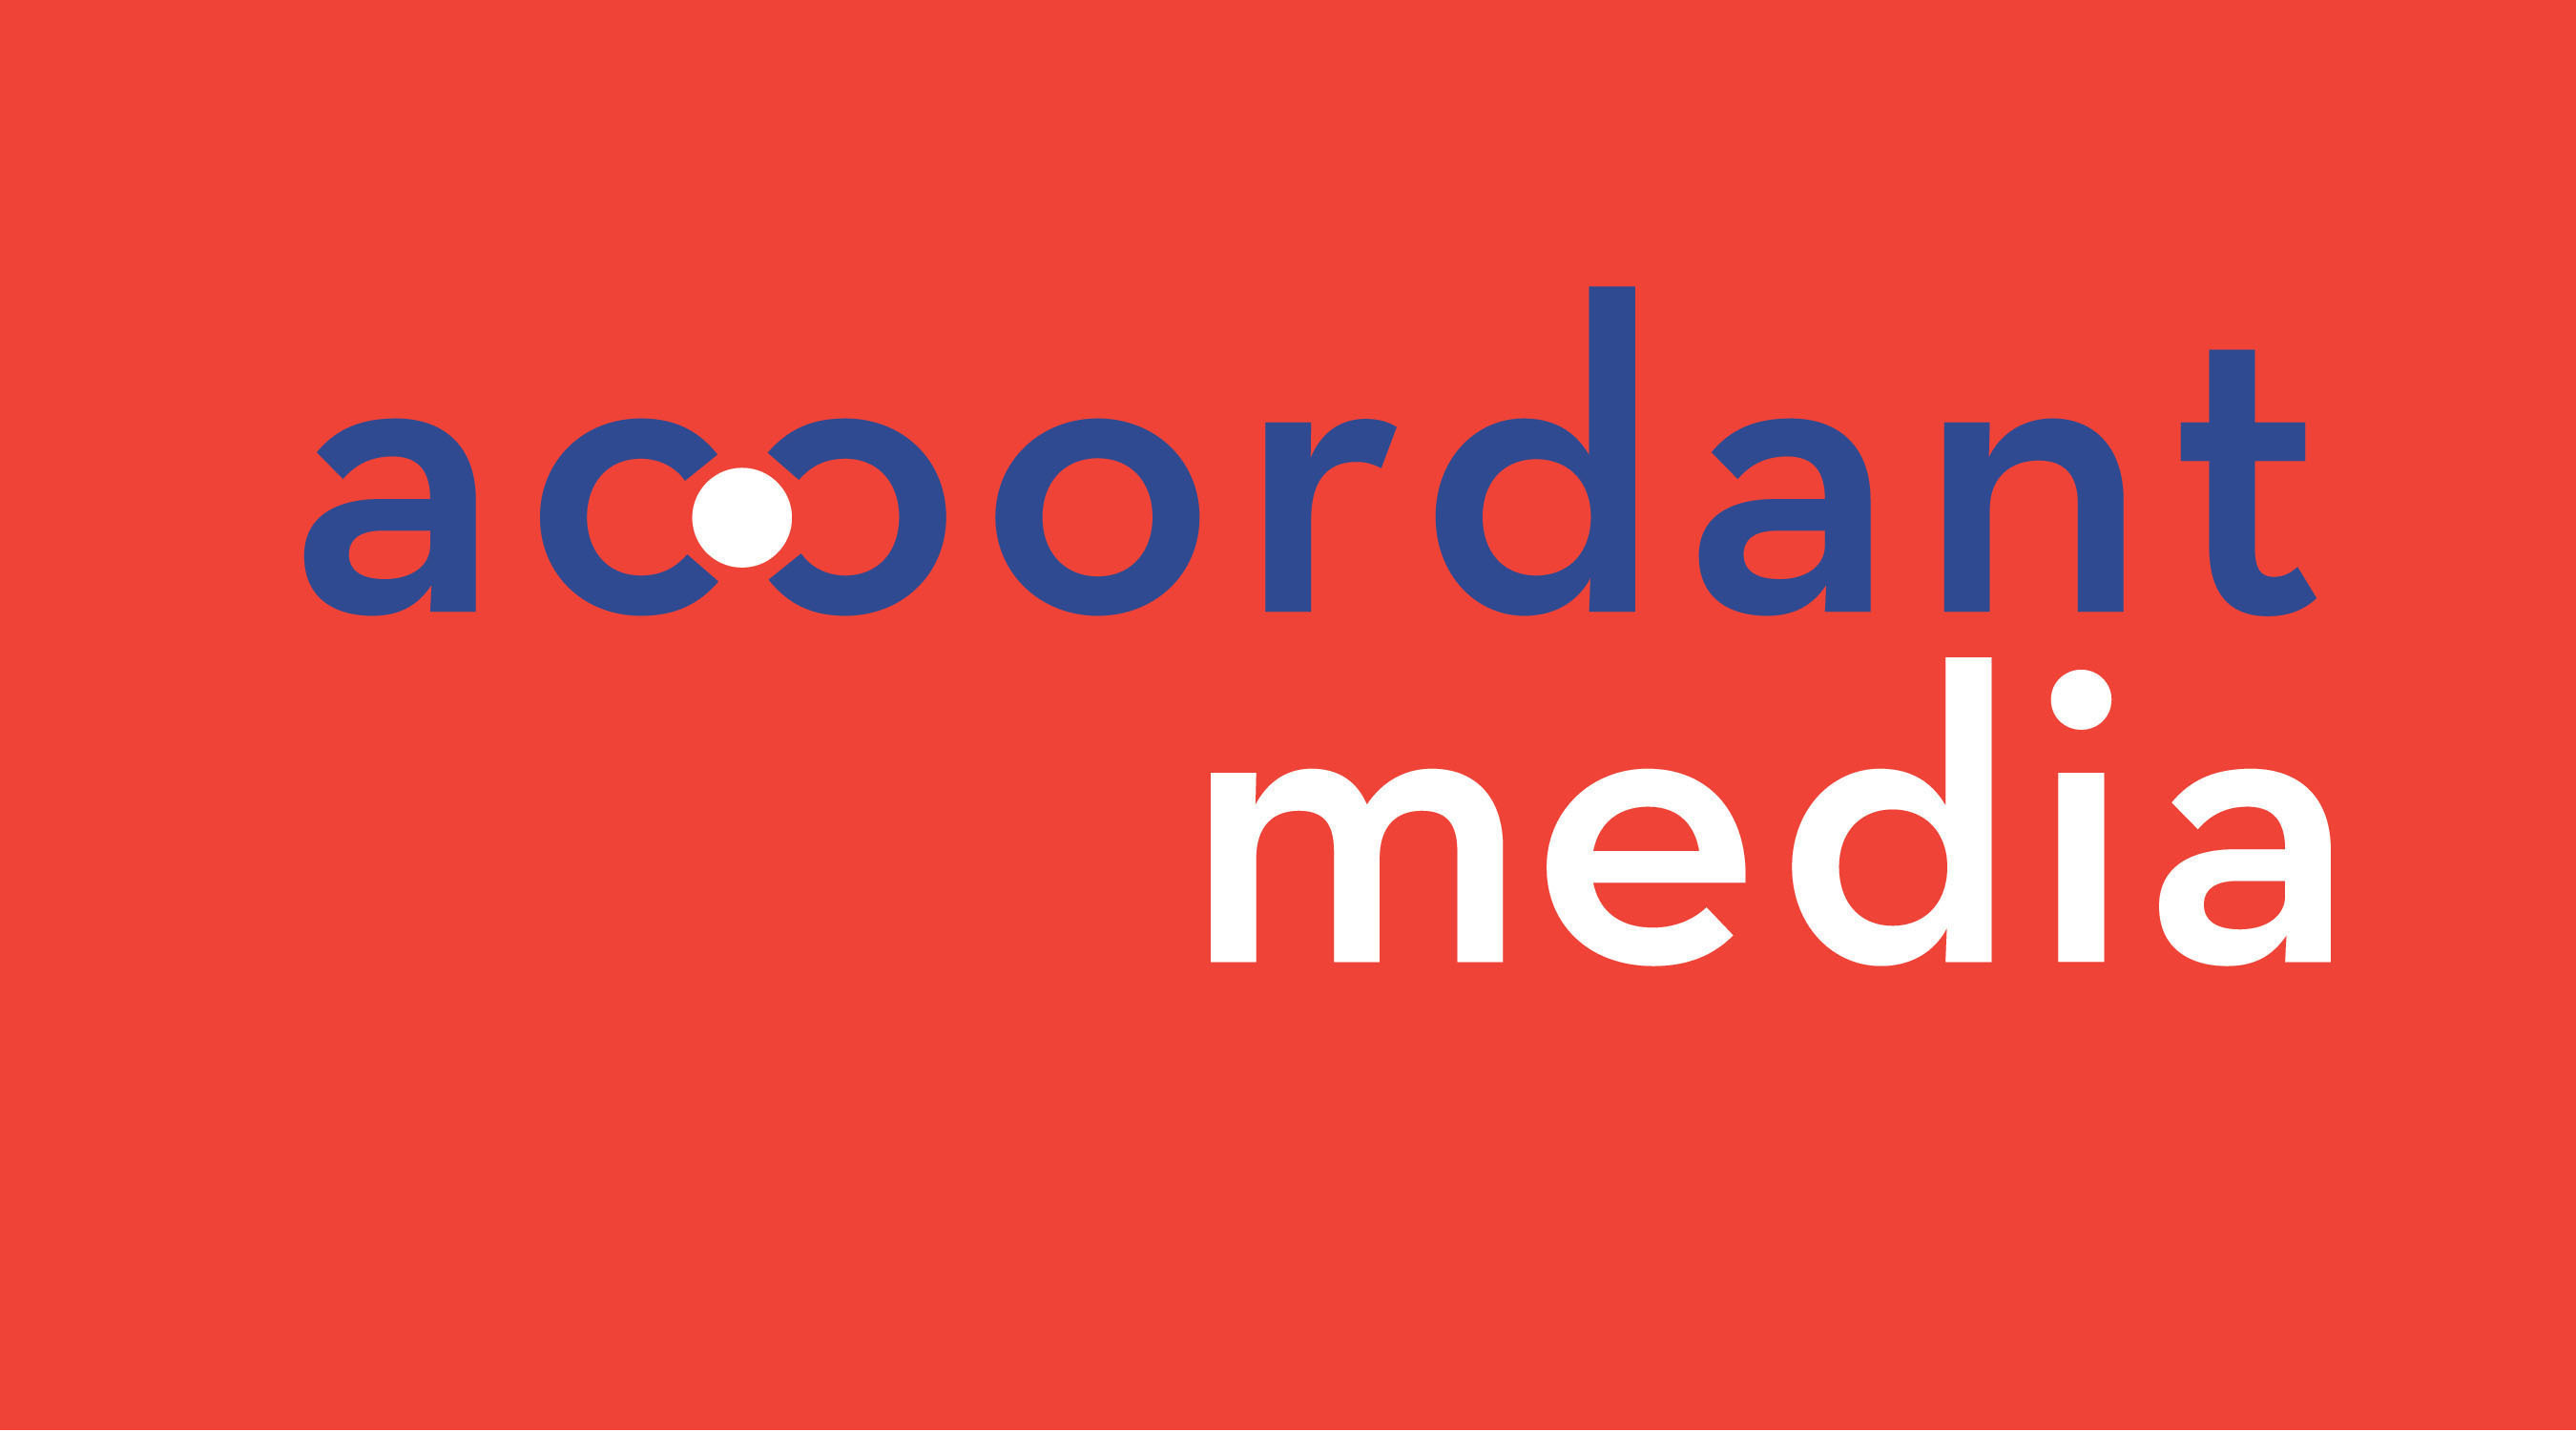 Accordant Media Expands San Francisco Operations